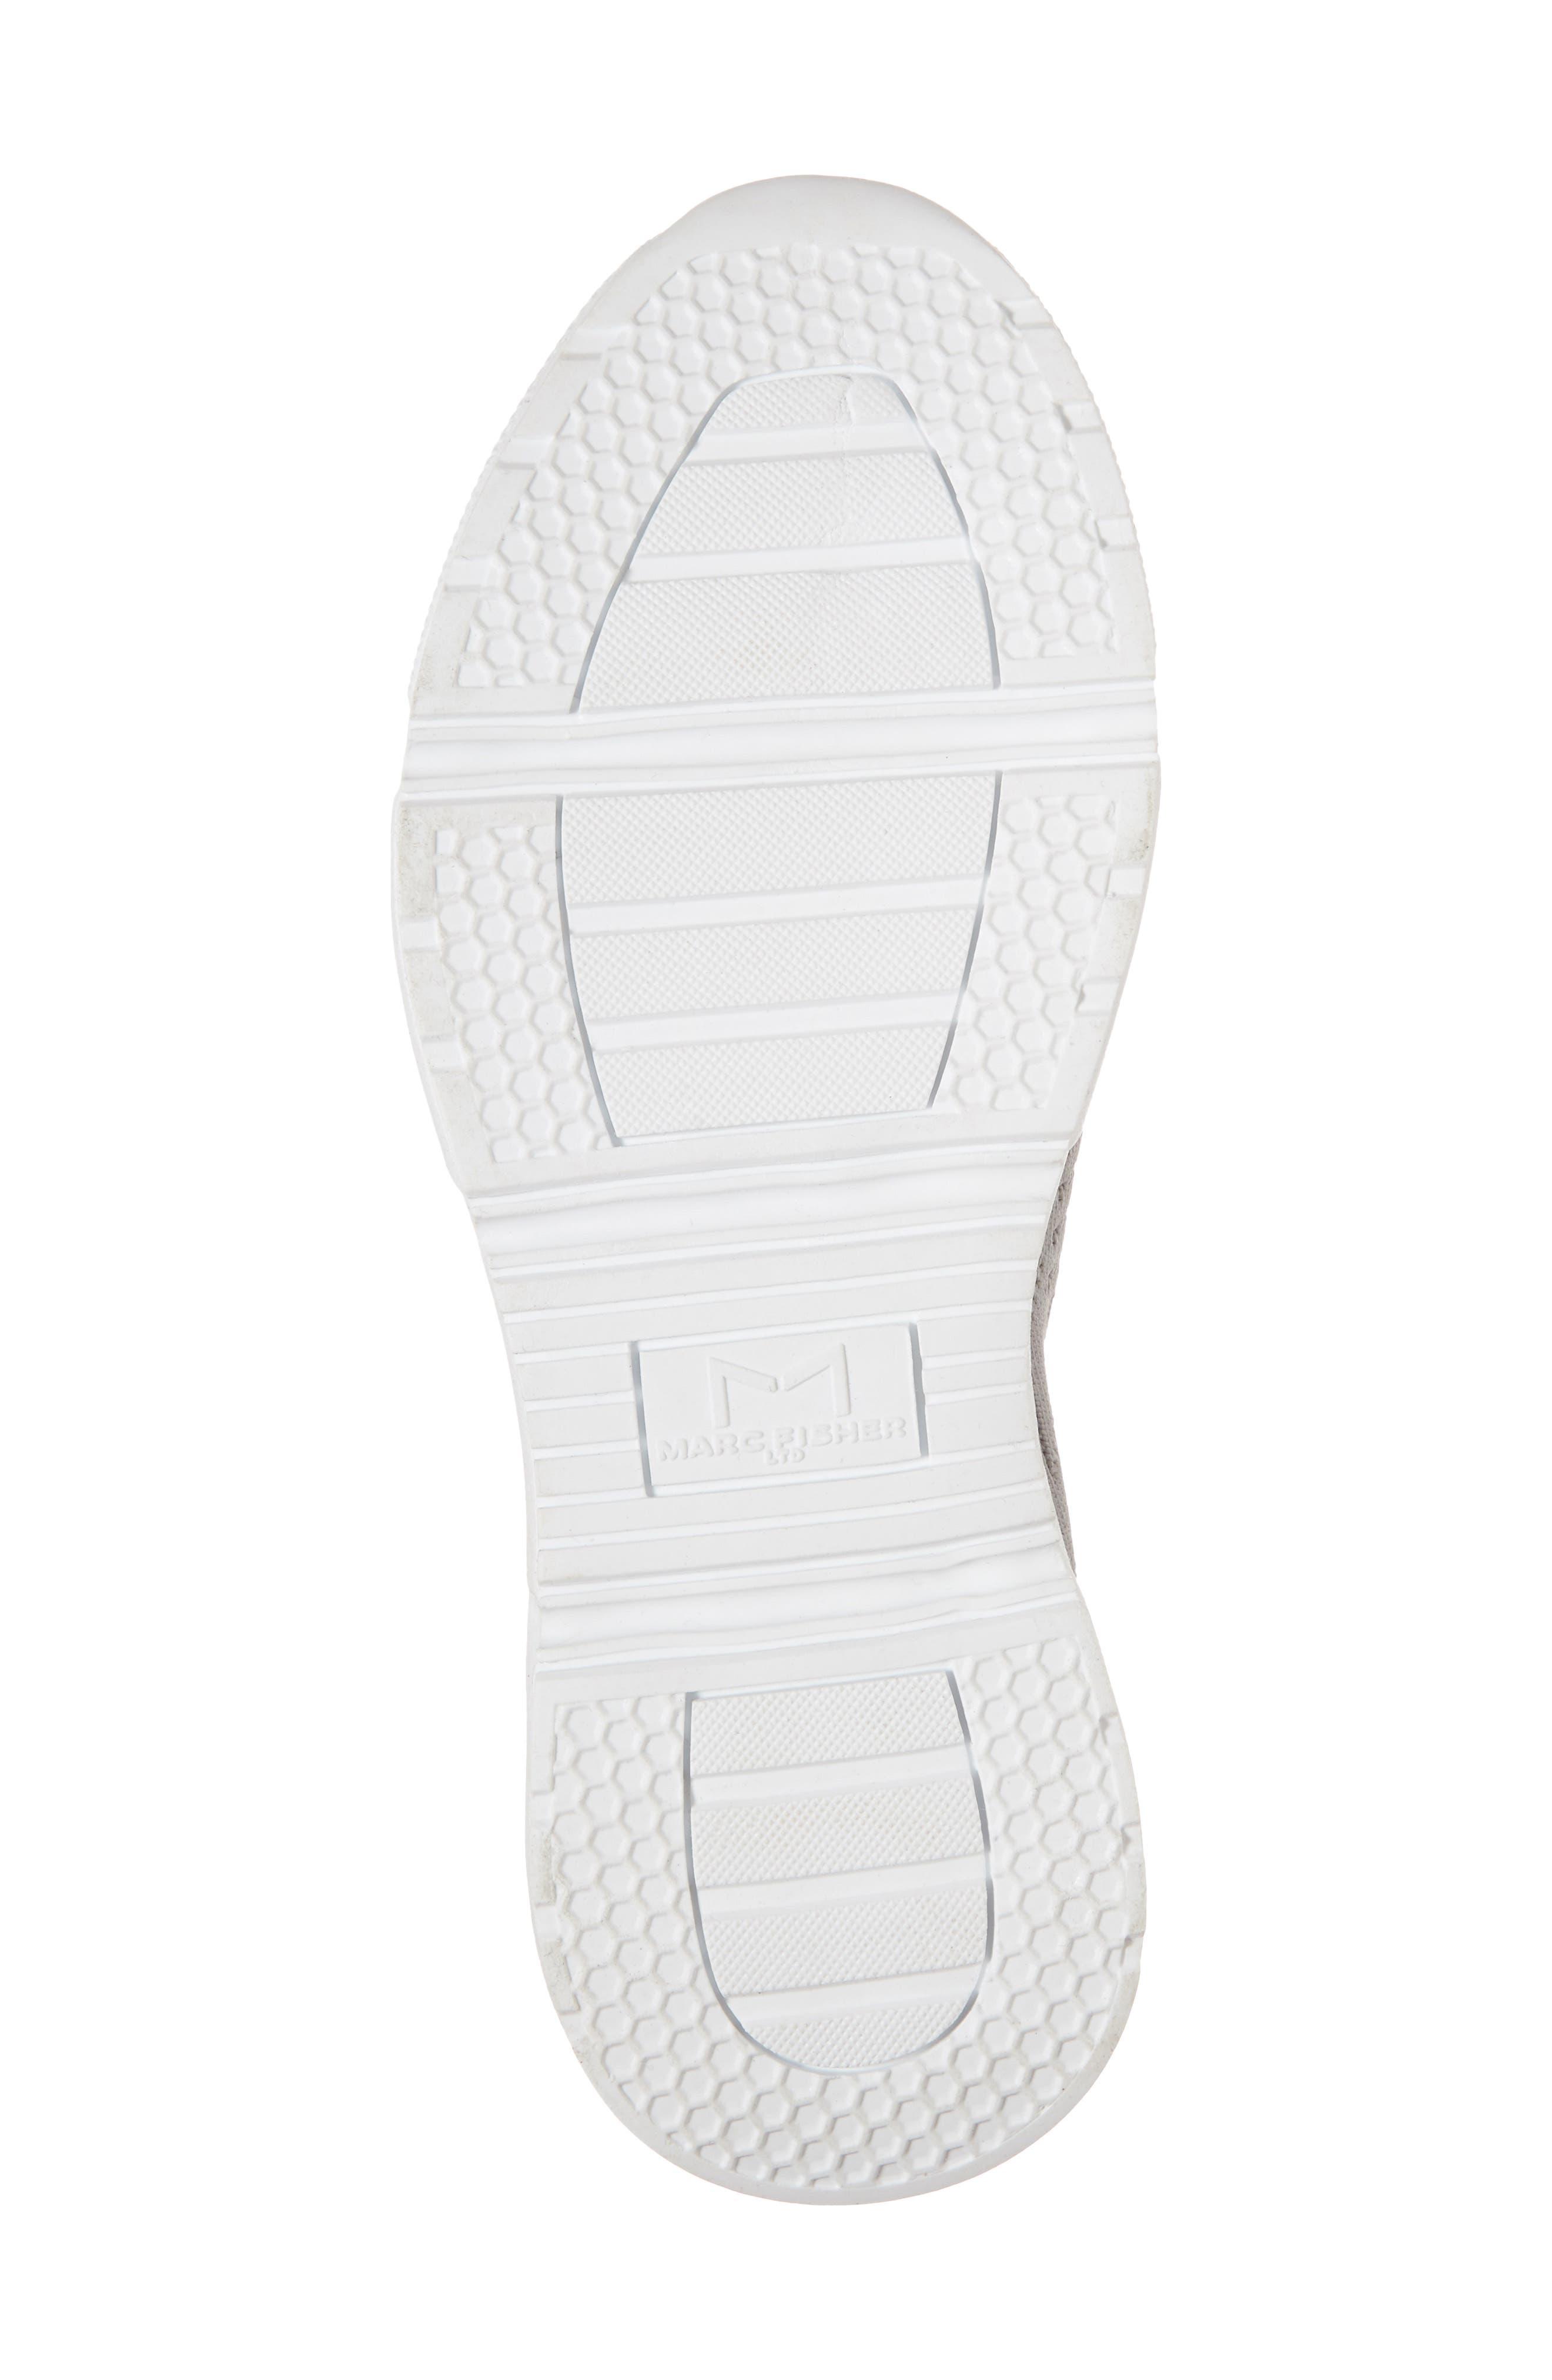 Karrie Slip-On Sneaker,                             Alternate thumbnail 6, color,                             Grey Stretch Fabric